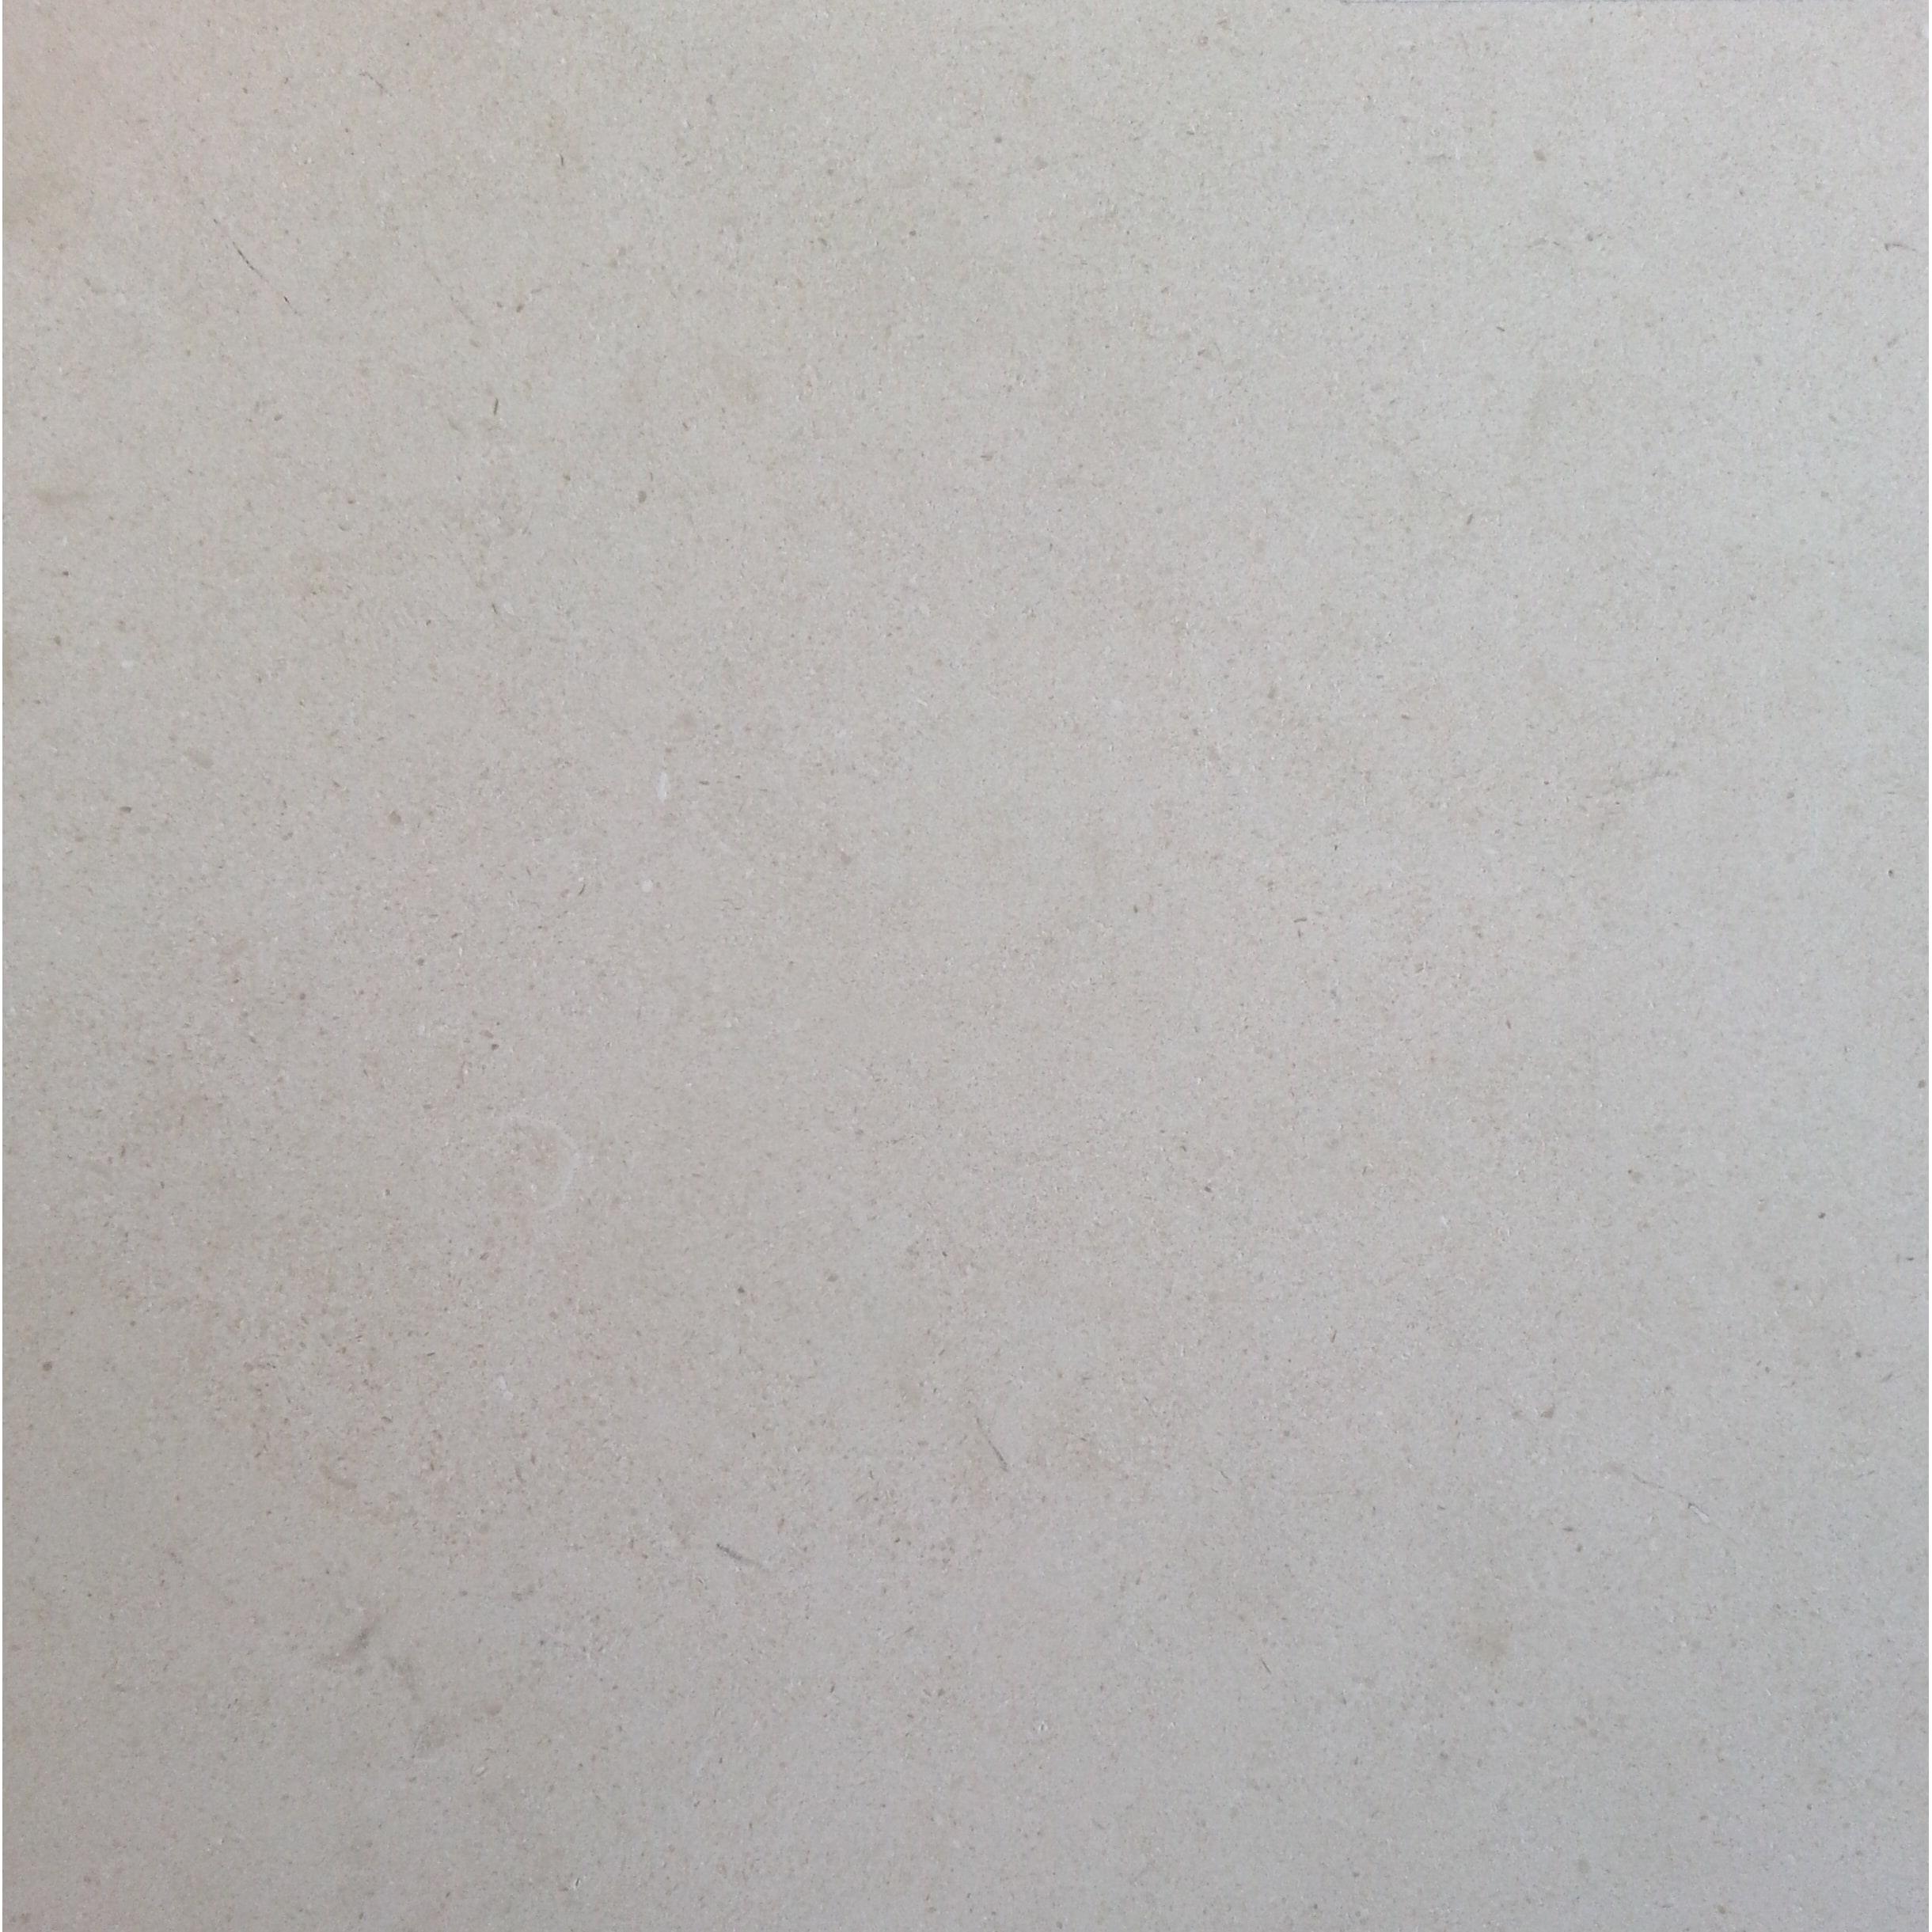 Shop Limestone 12-inch La Perla Natural Floor and Bathroom Tile ...